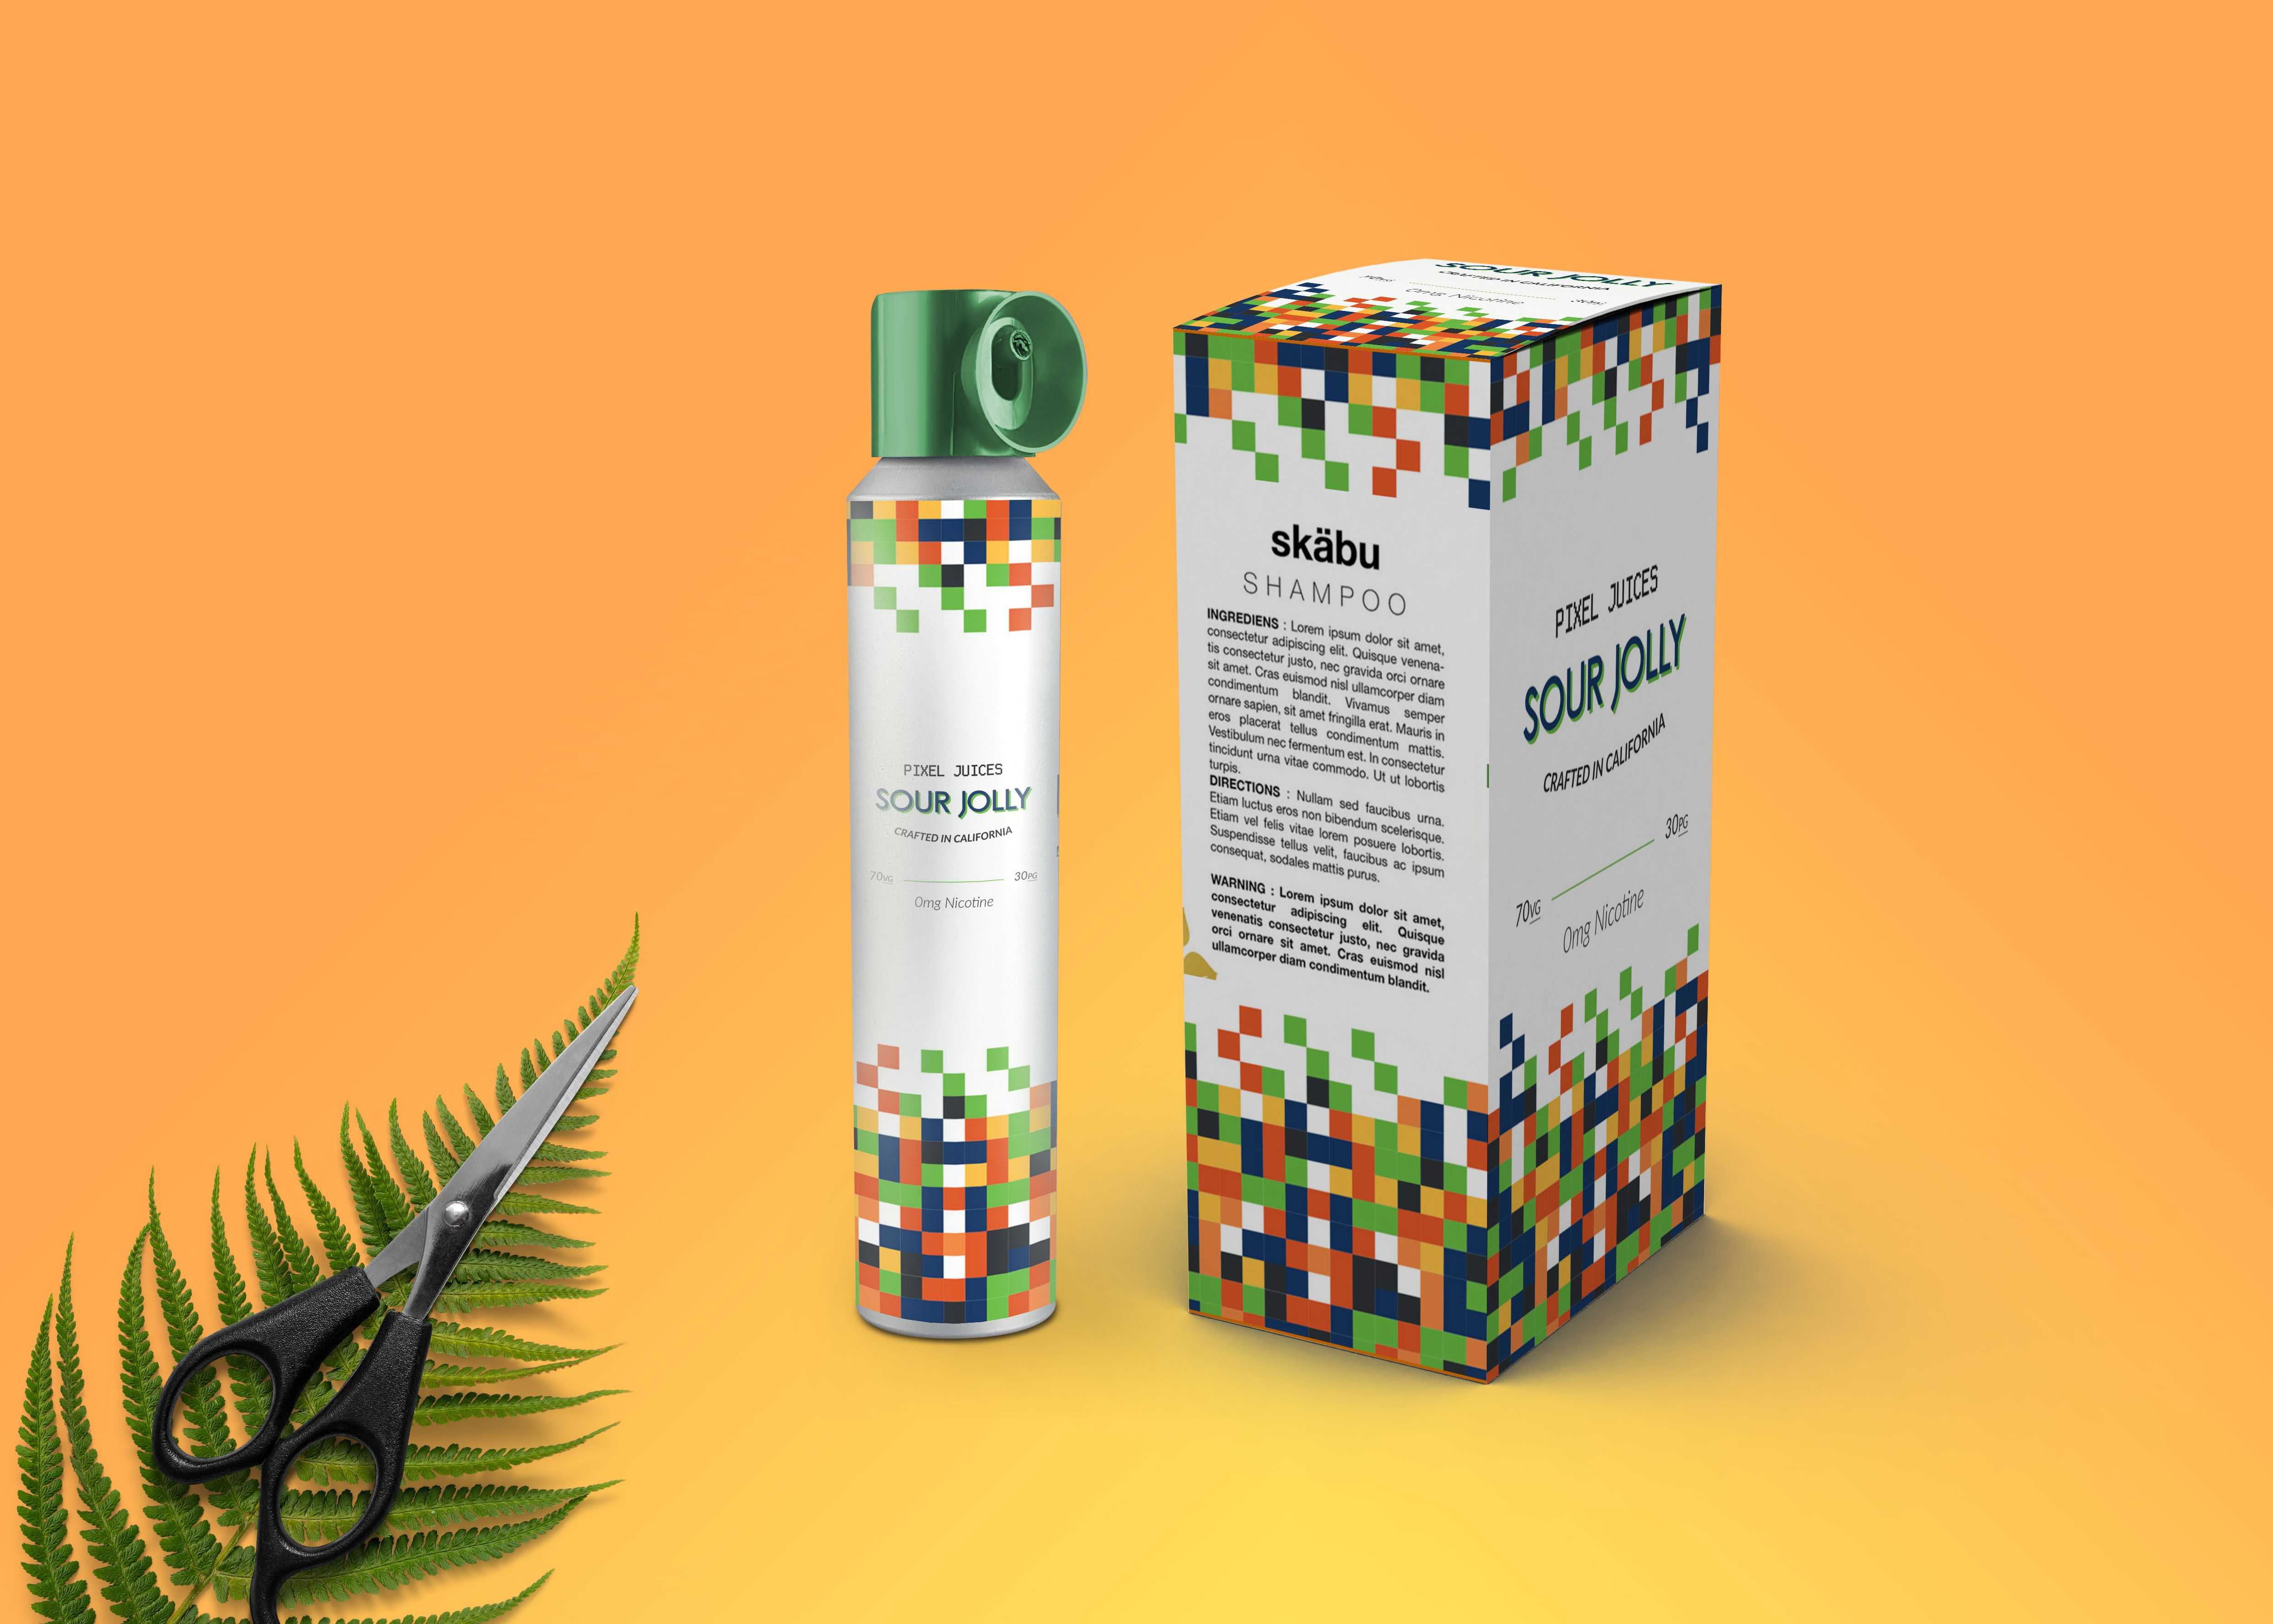 Salon Hair Oil Spray Bottle Label Mockup in 2020 Hair